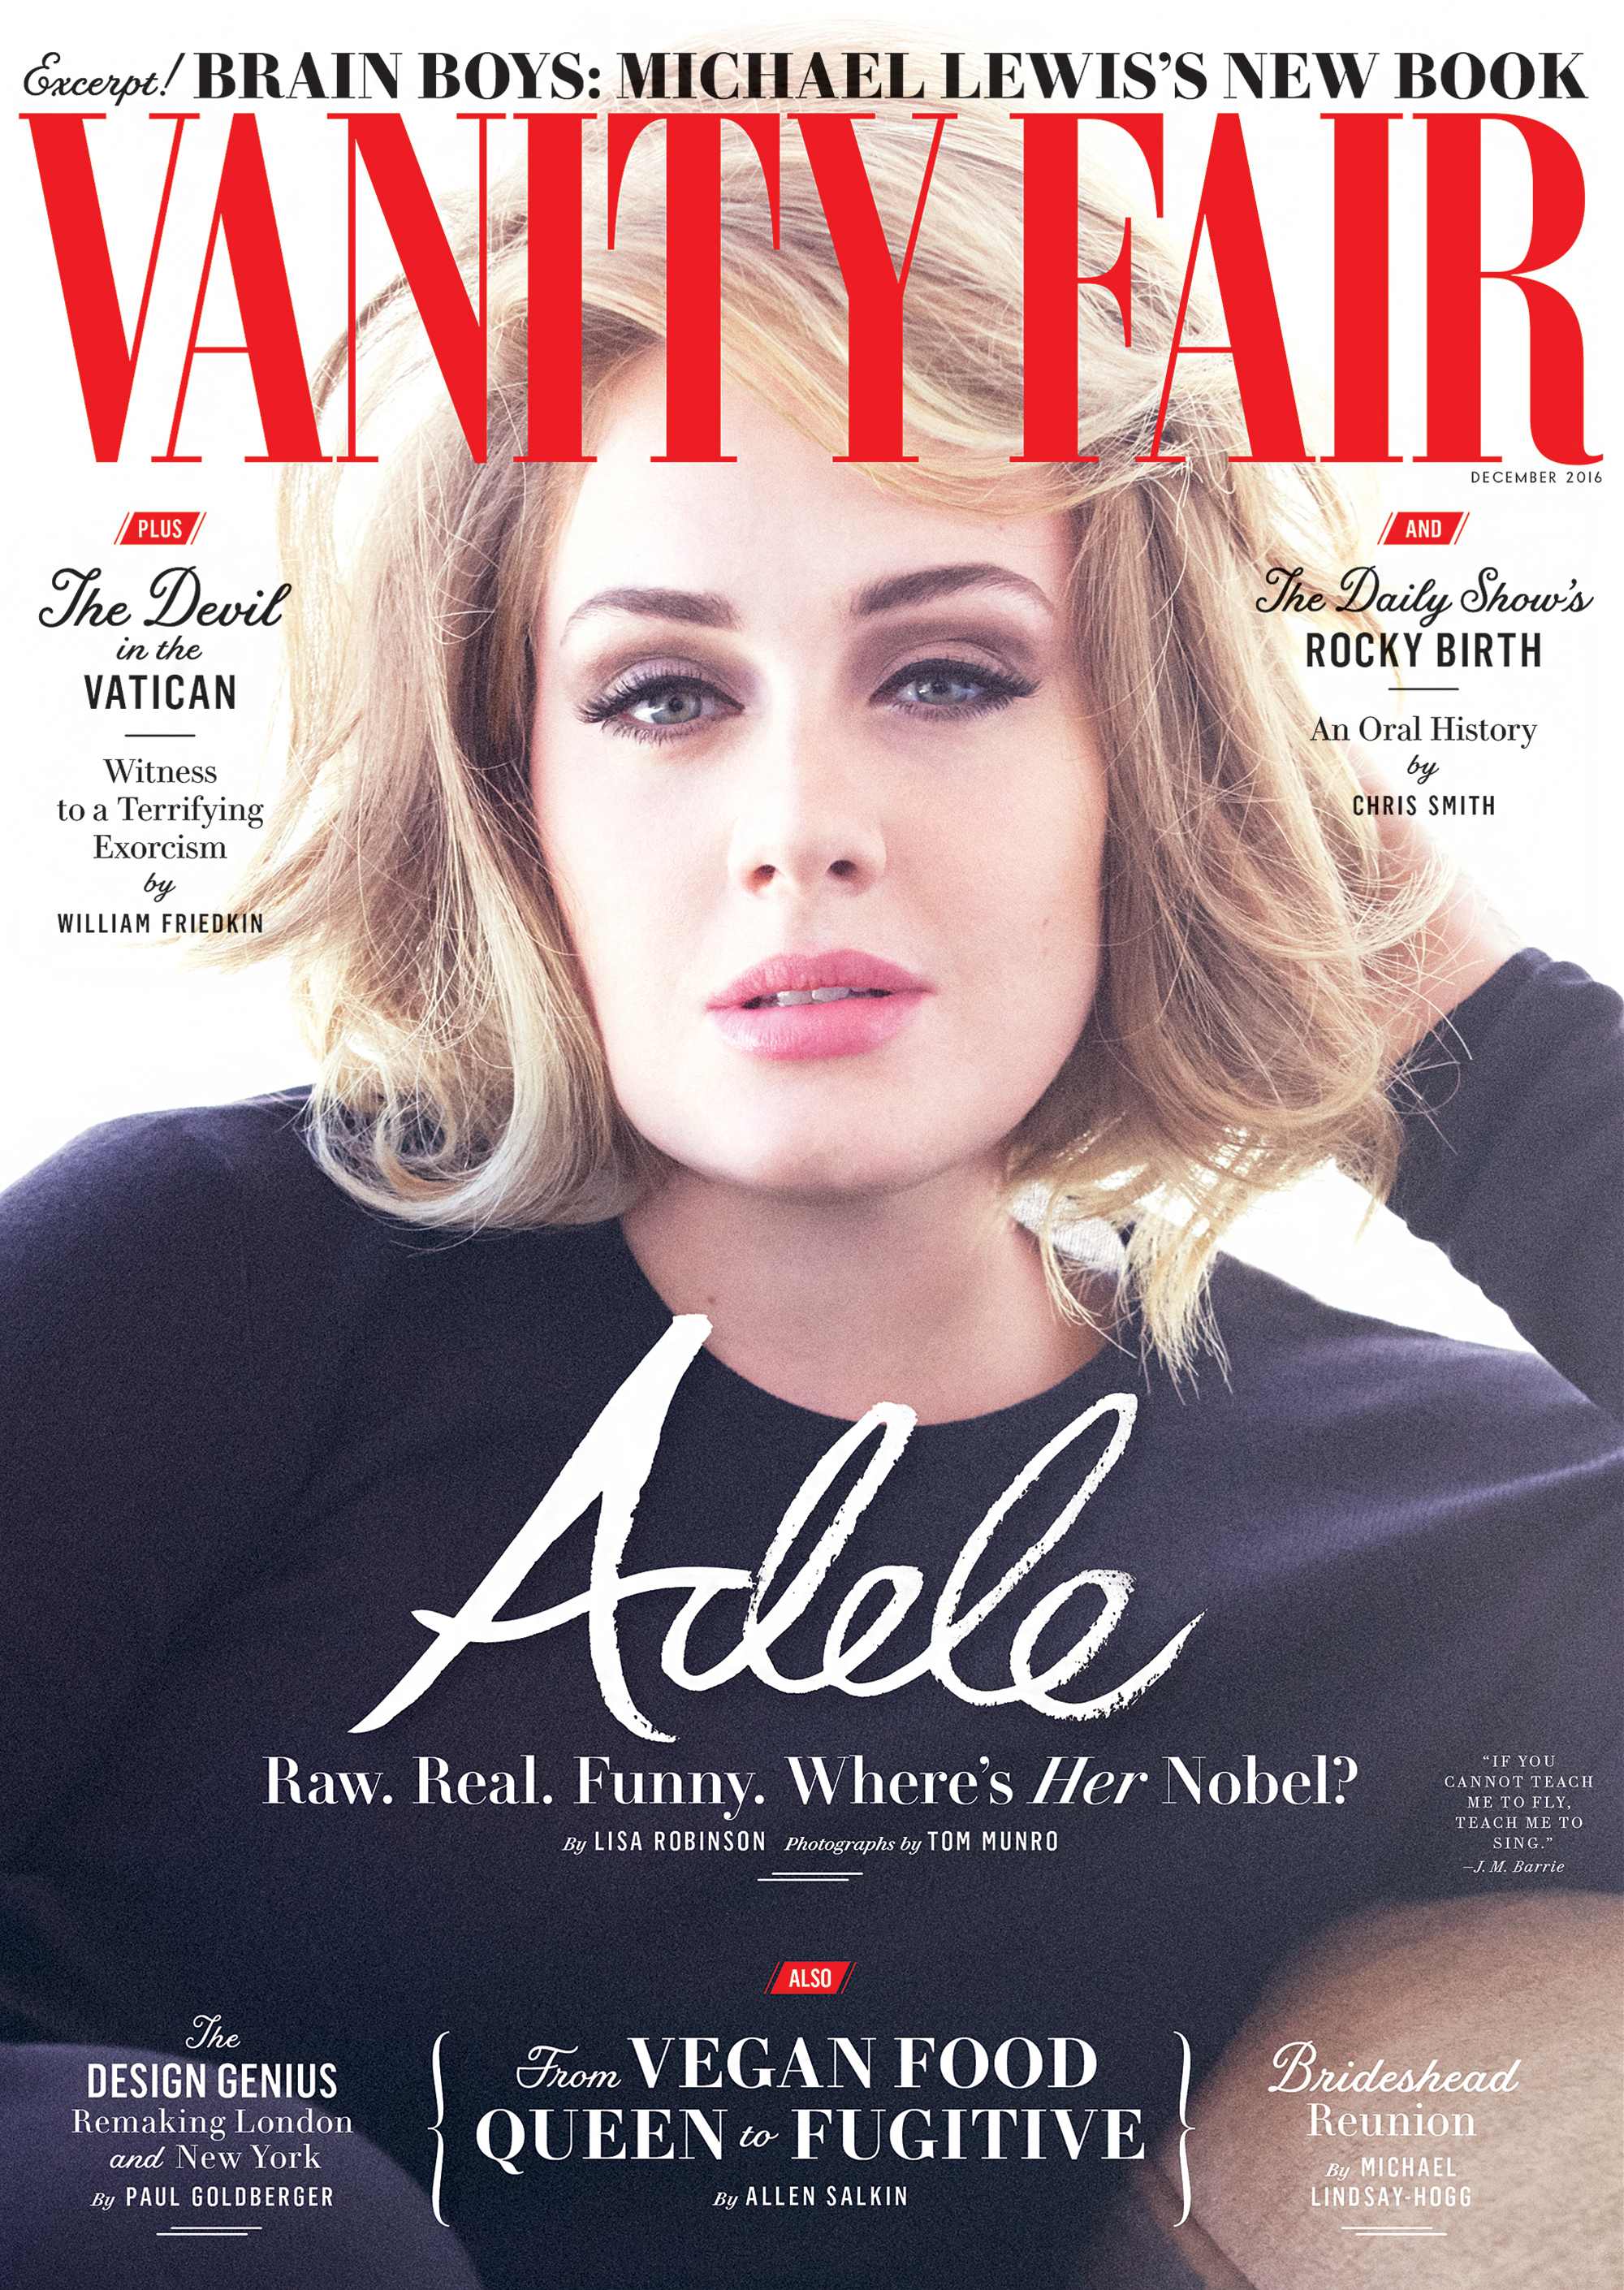 adele-vanity-fair-cover-zoom-622f4e2d-0430-4aa2-a9da-2ac579c3ef0a.jpg